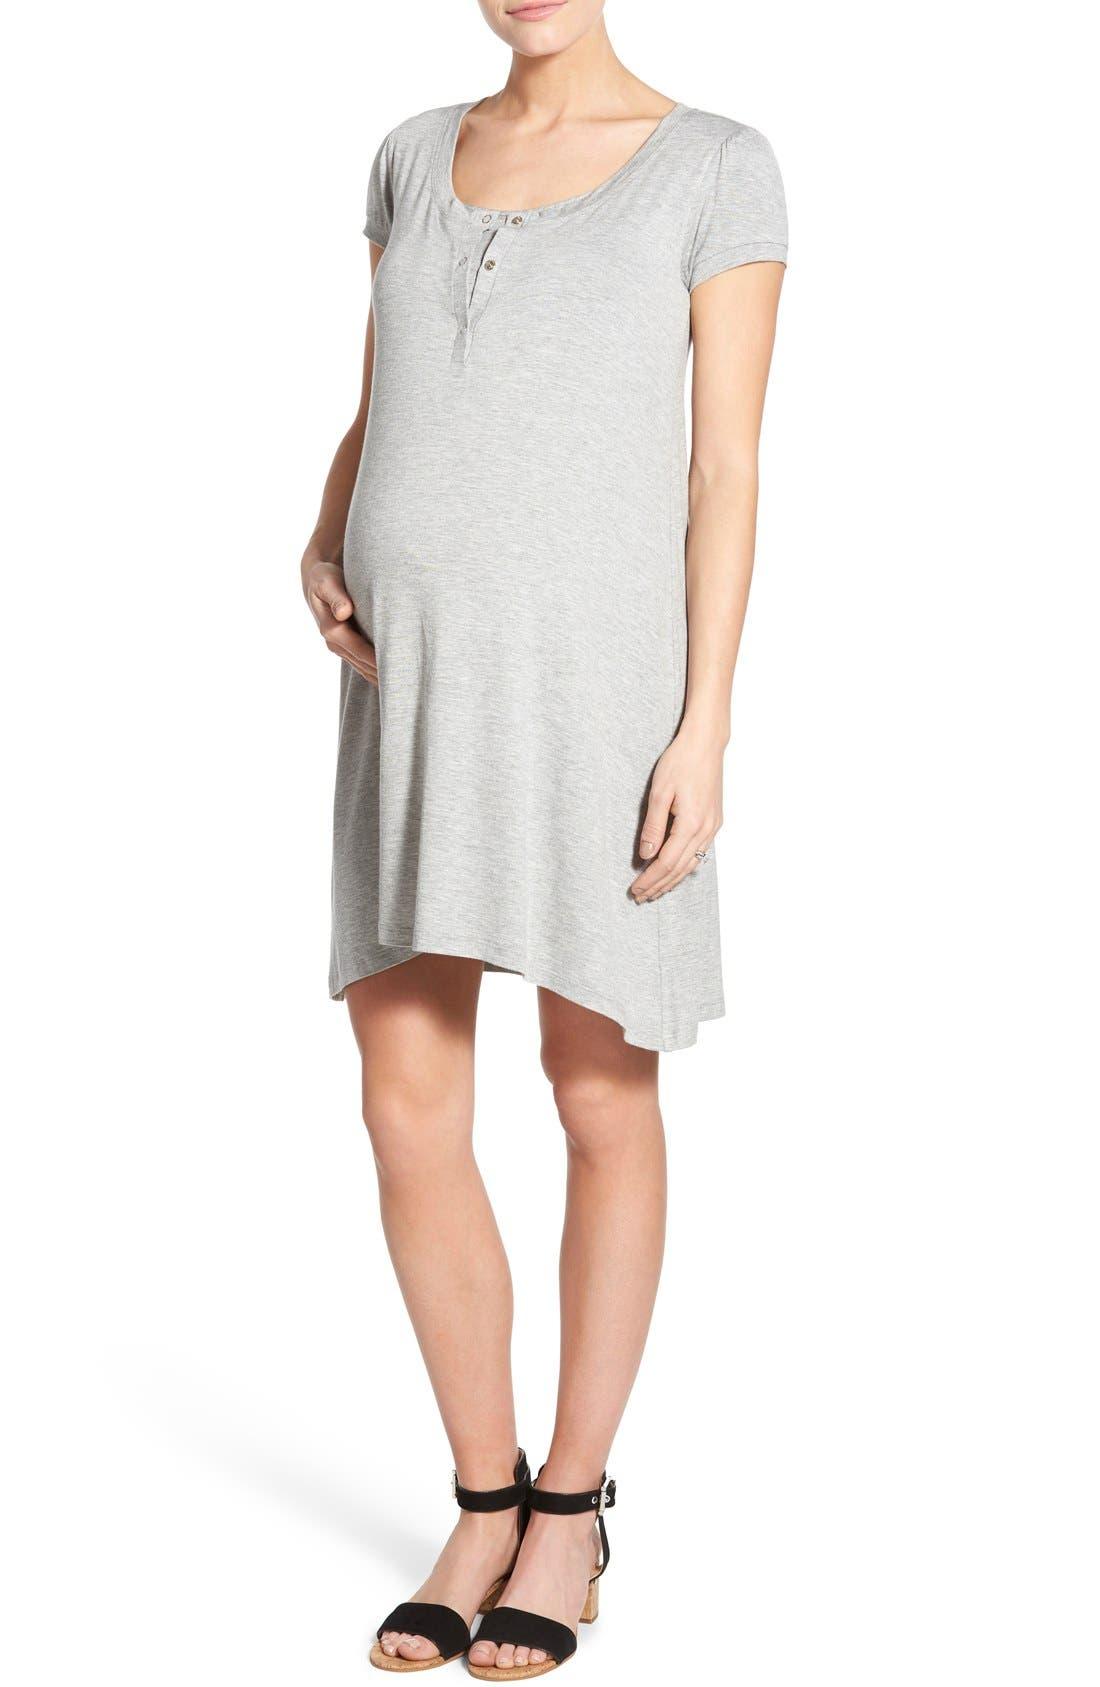 LAB40 'Poppy' Maternity/Nursing Swing Dress